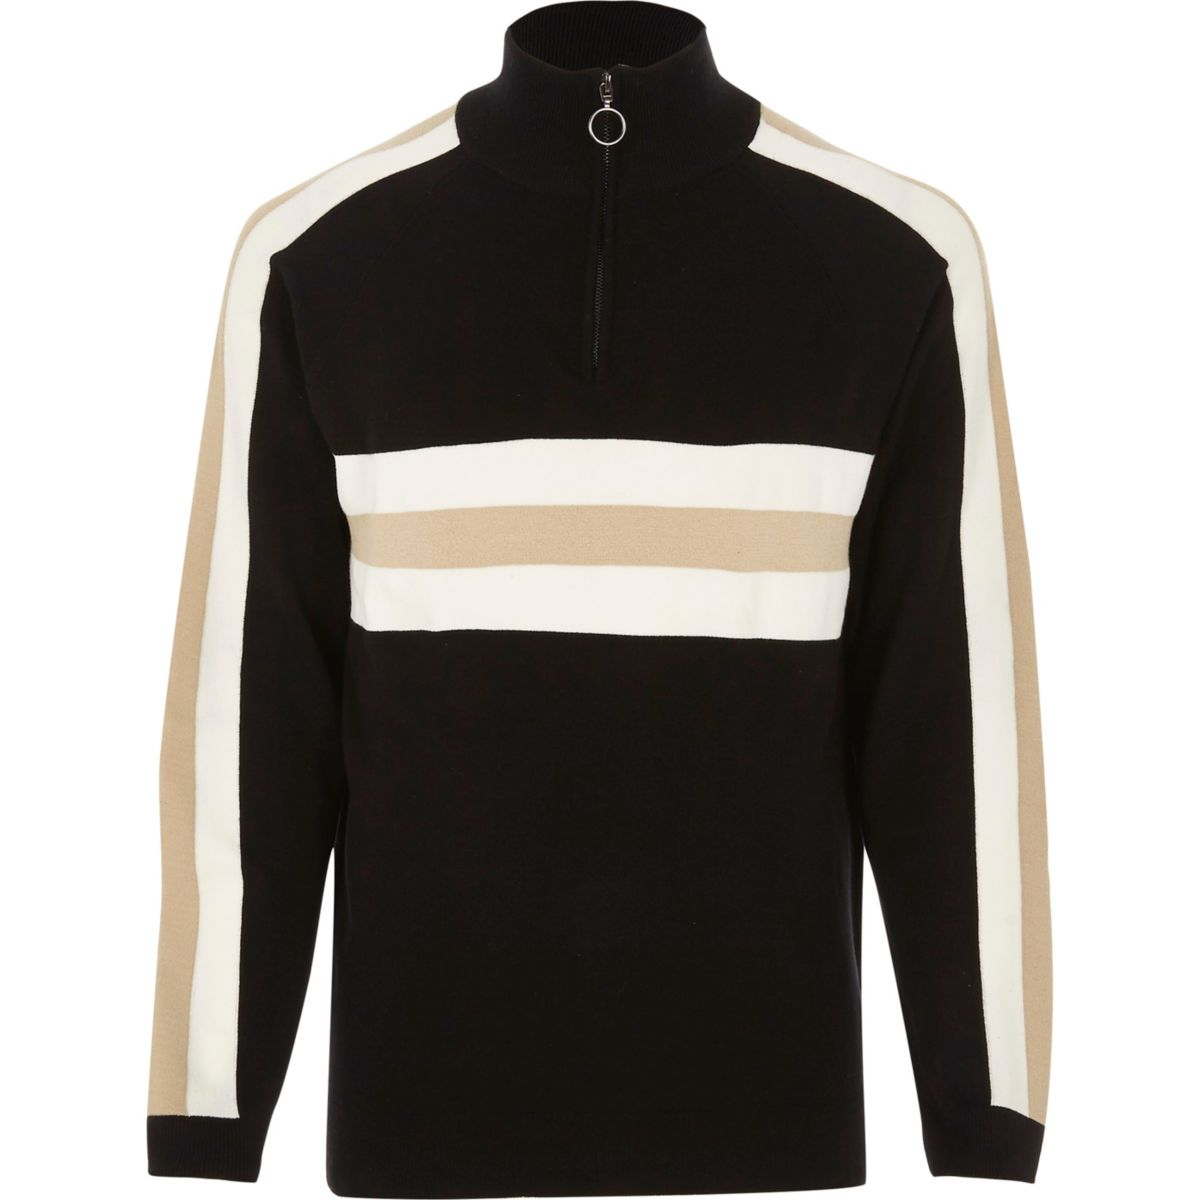 Black Bellfield blocked high neck sweatshirt